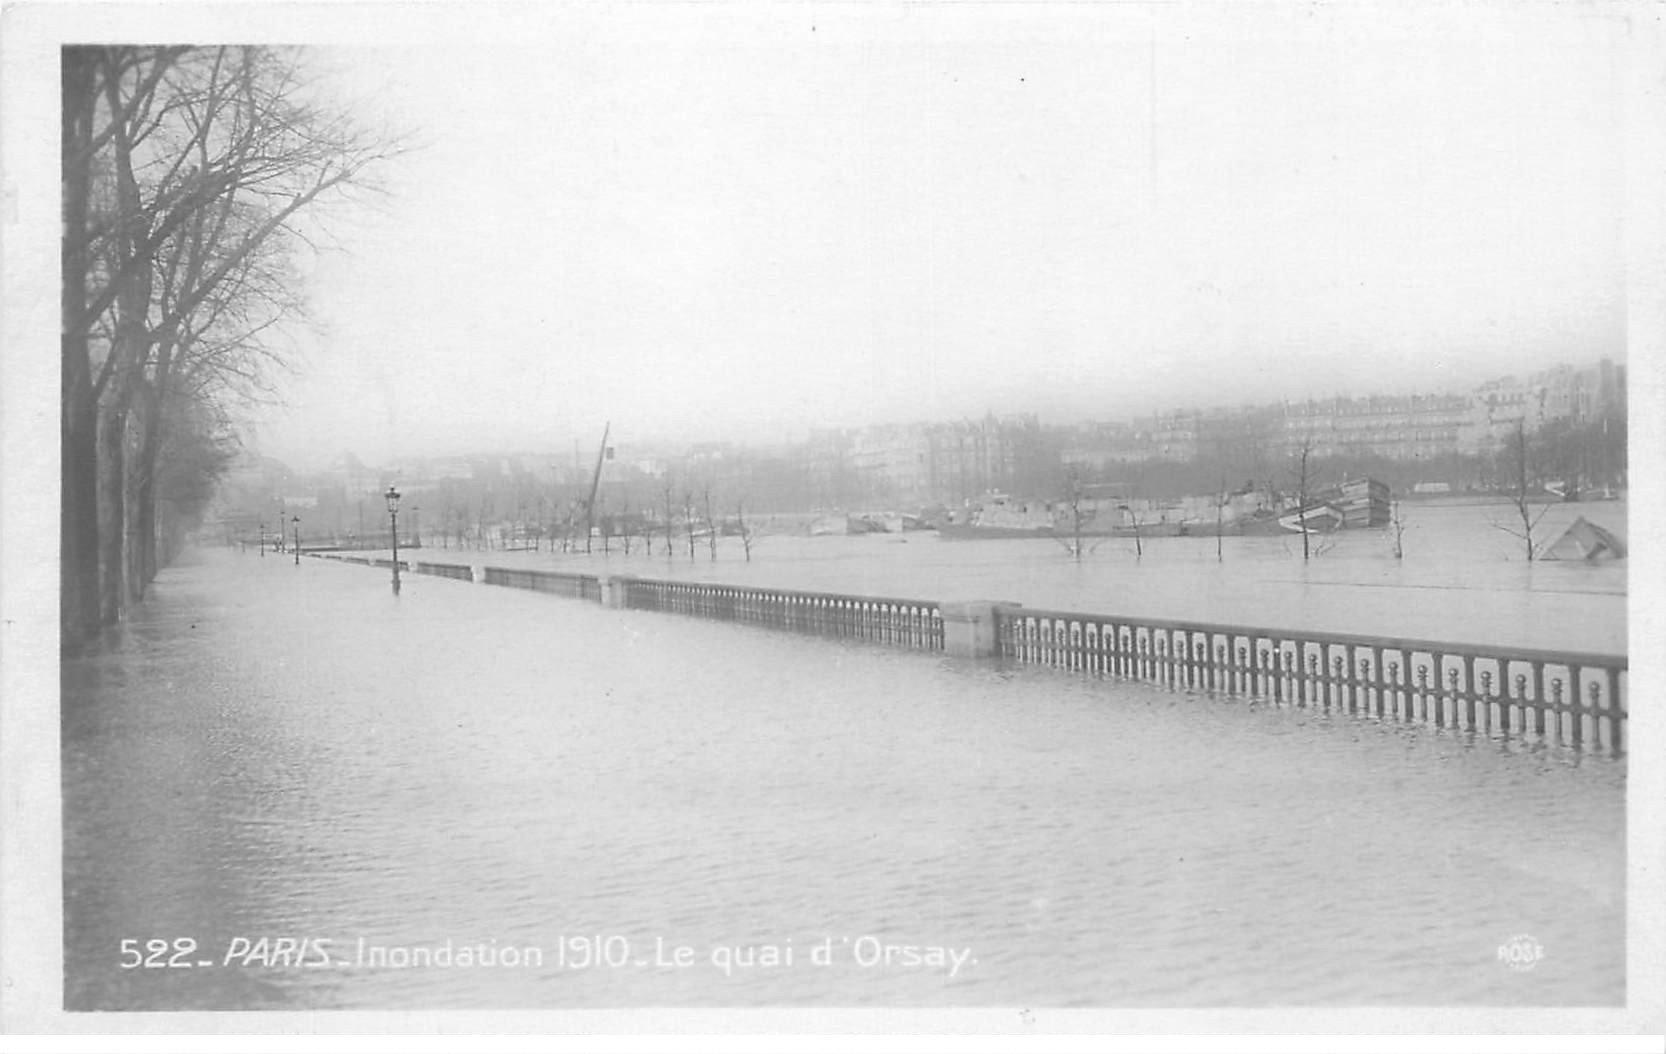 INONDATION DE PARIS 1910. Quay d'Orsay. Edition Rose